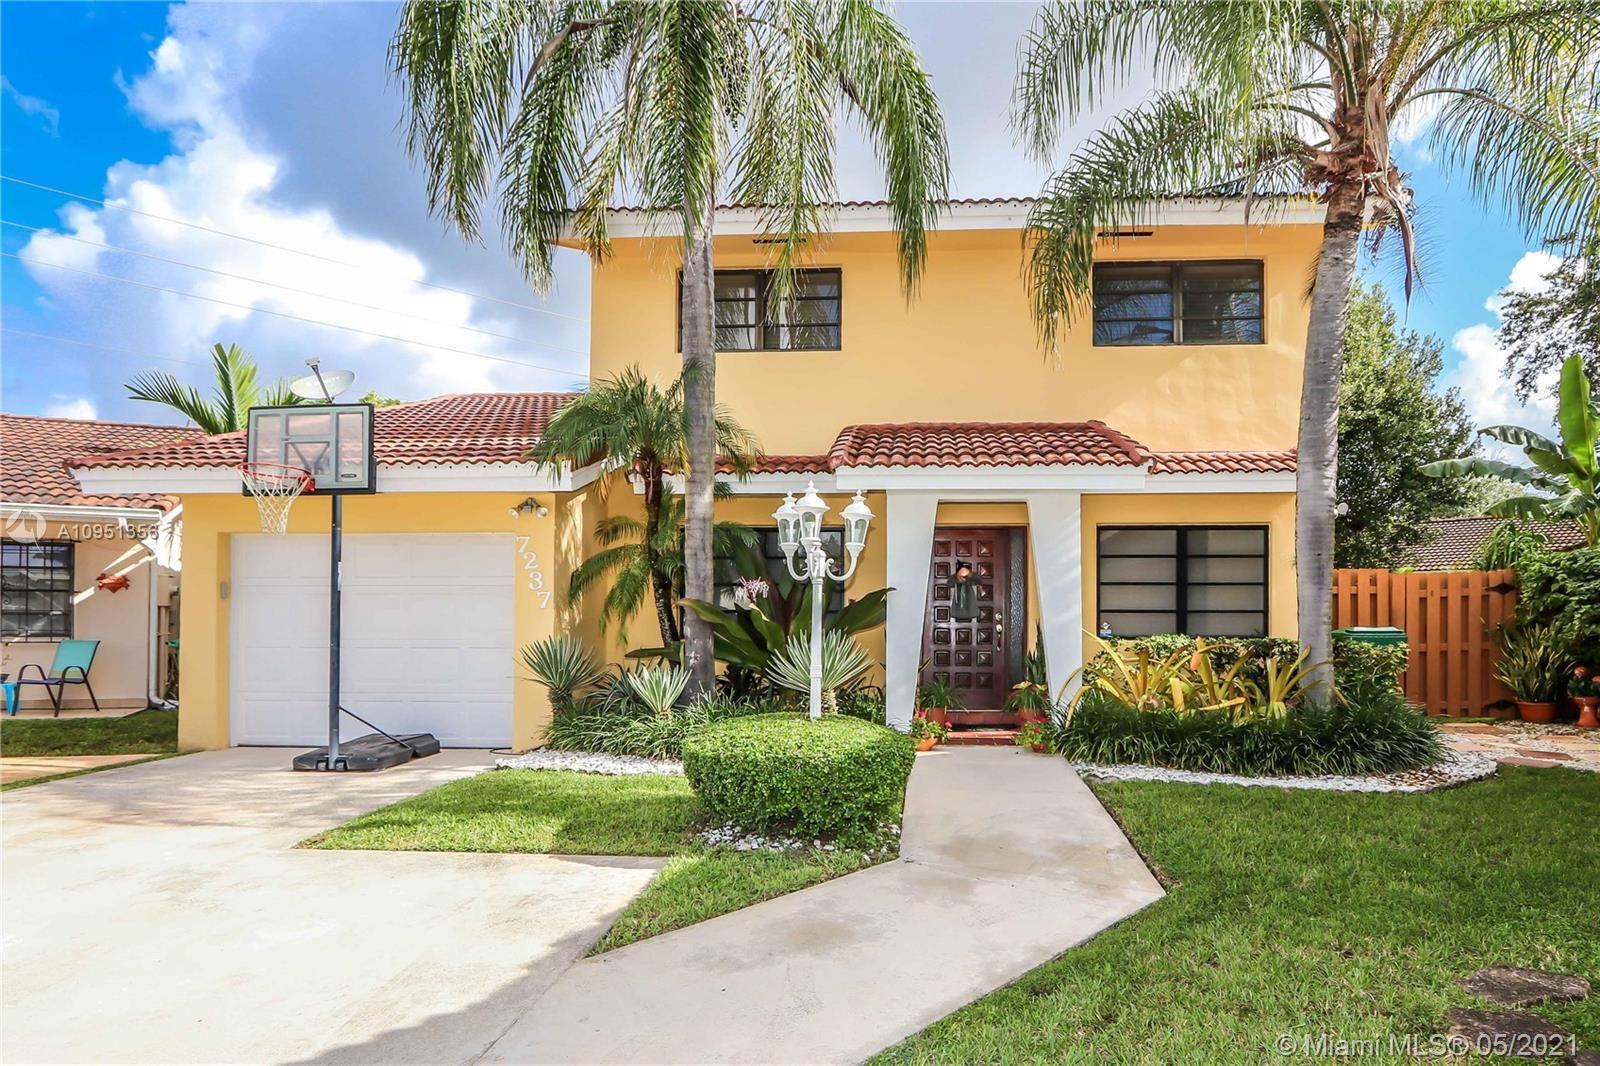 7237 SW 112th Place Cir, Miami, FL 33173 - #: A10951356